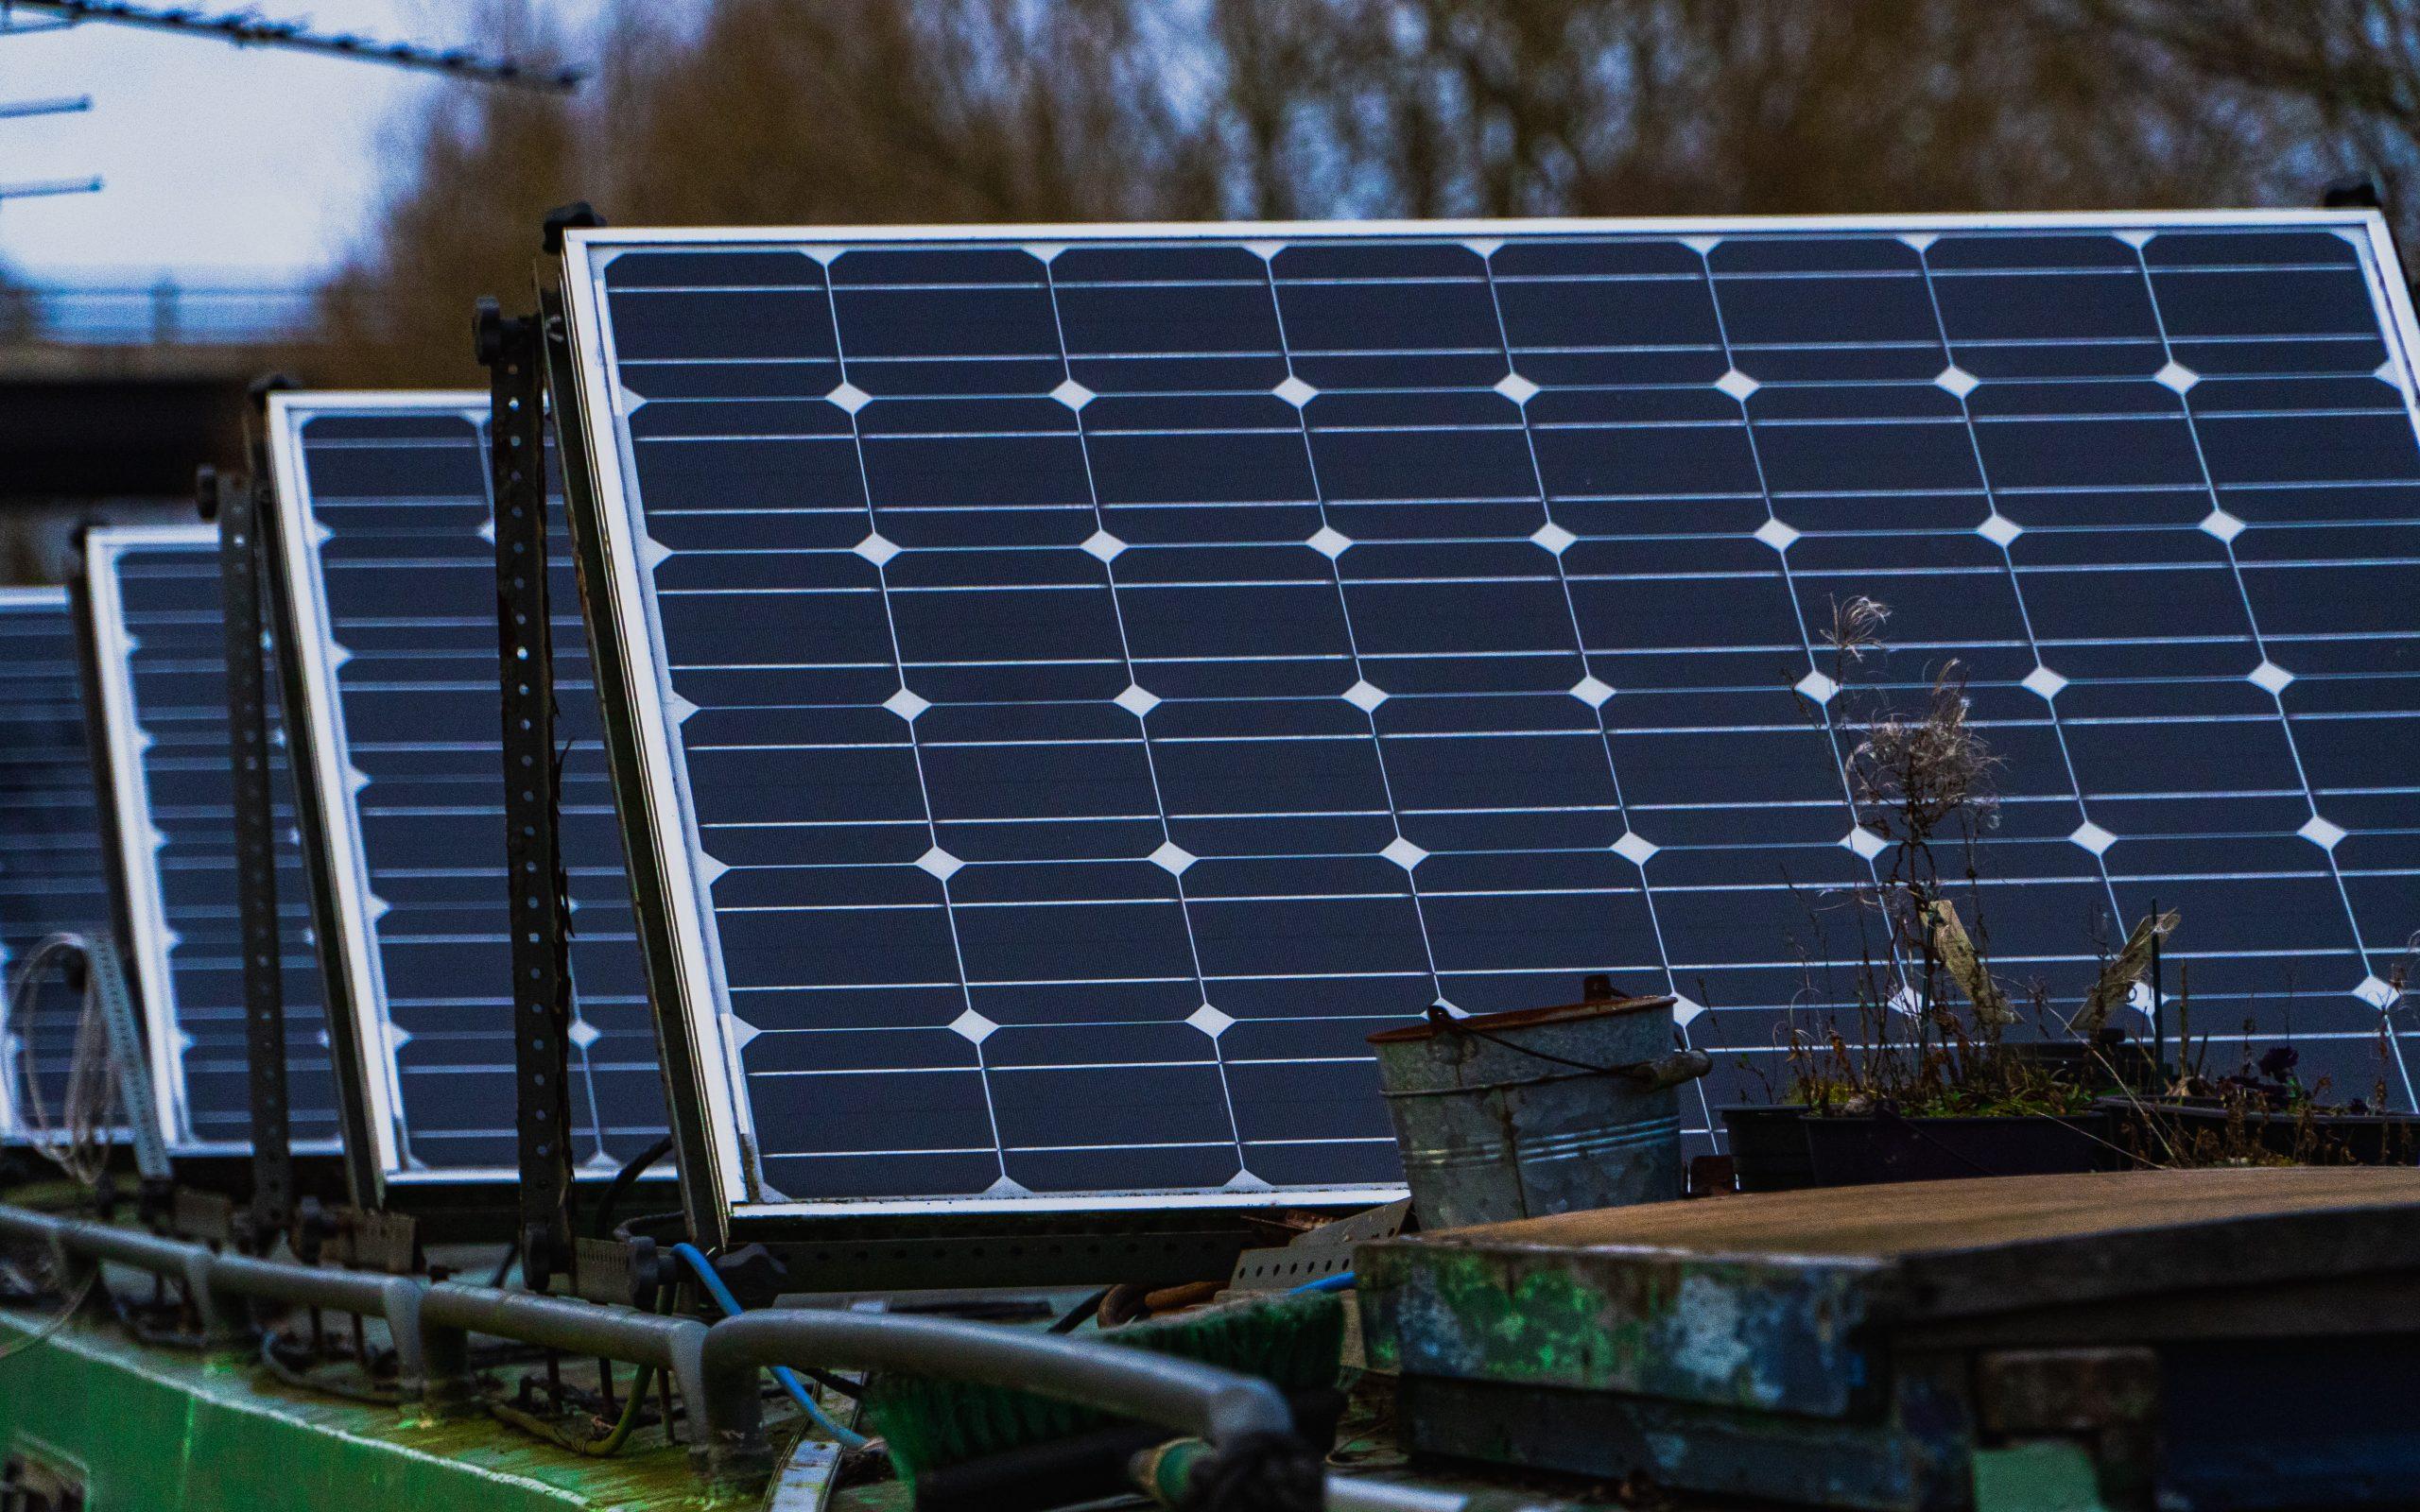 Requisitos de CFE para instalar paneles solares